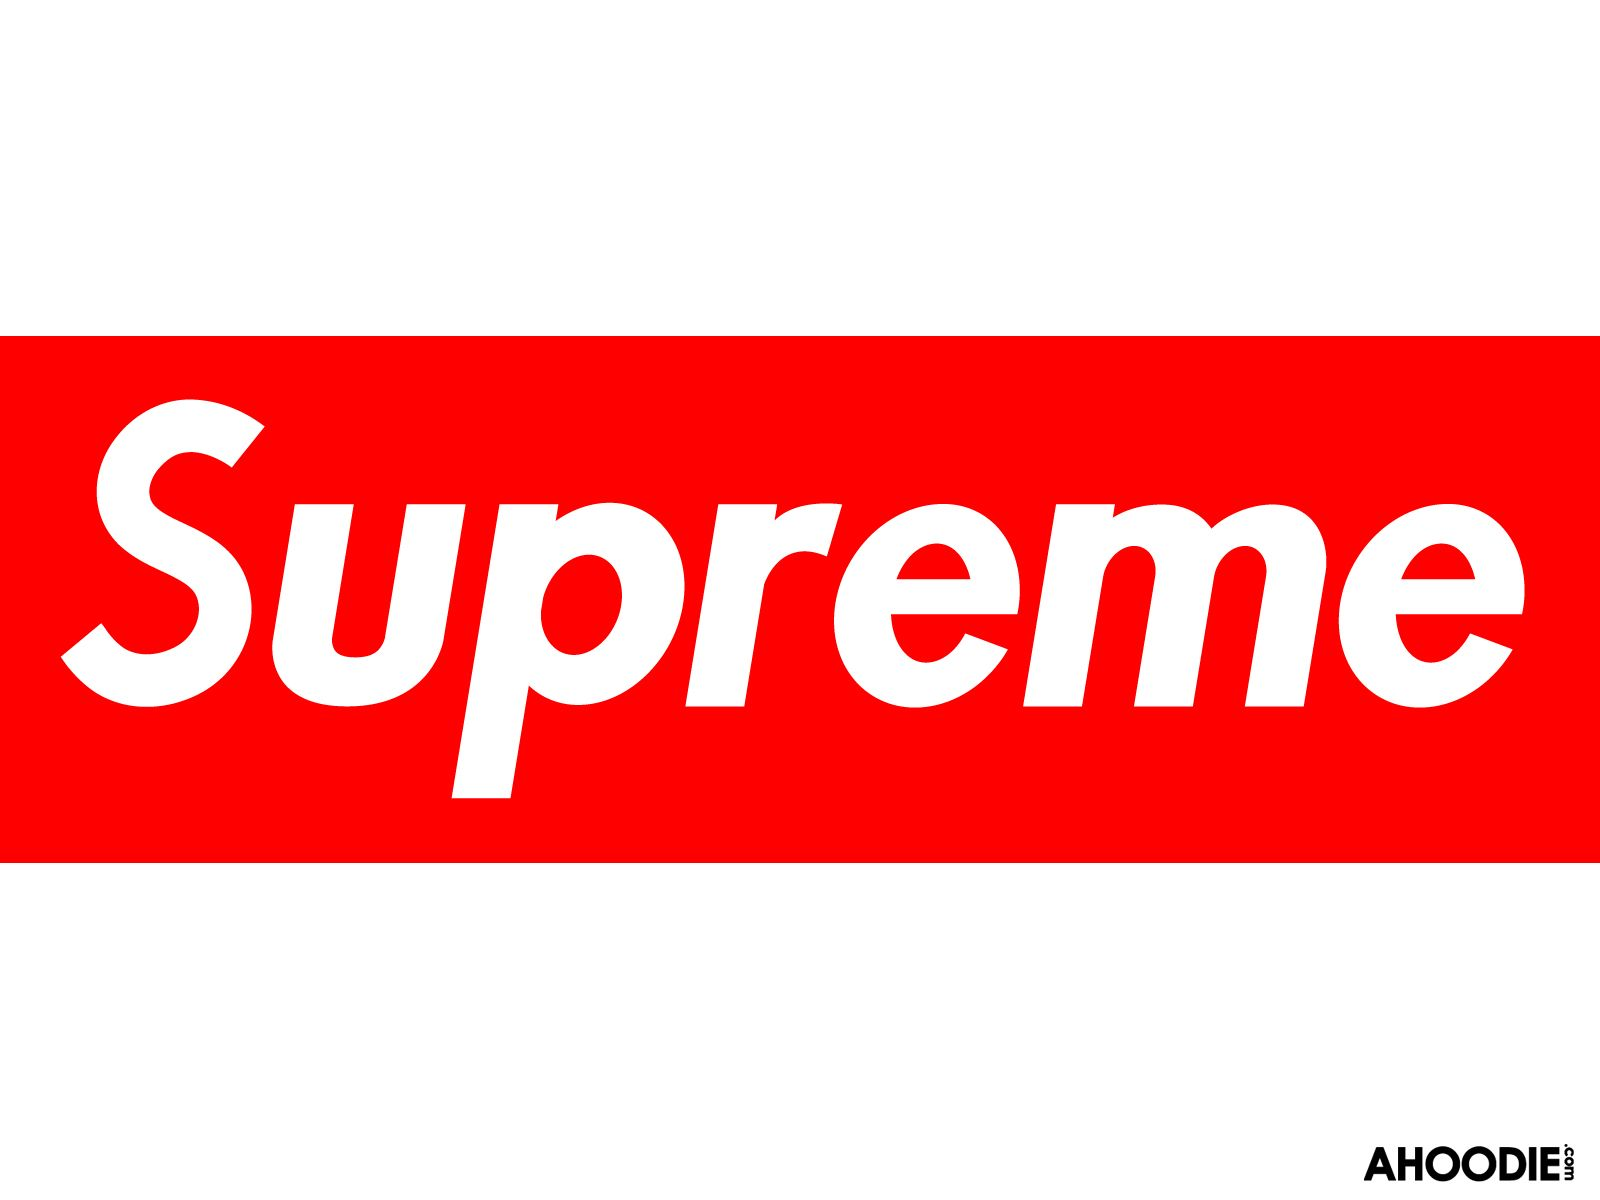 SUPREME RED CLASSIC STICKER BOX LOGO WHITE FREE SHOPPING BAG VINYL DECAL CDG